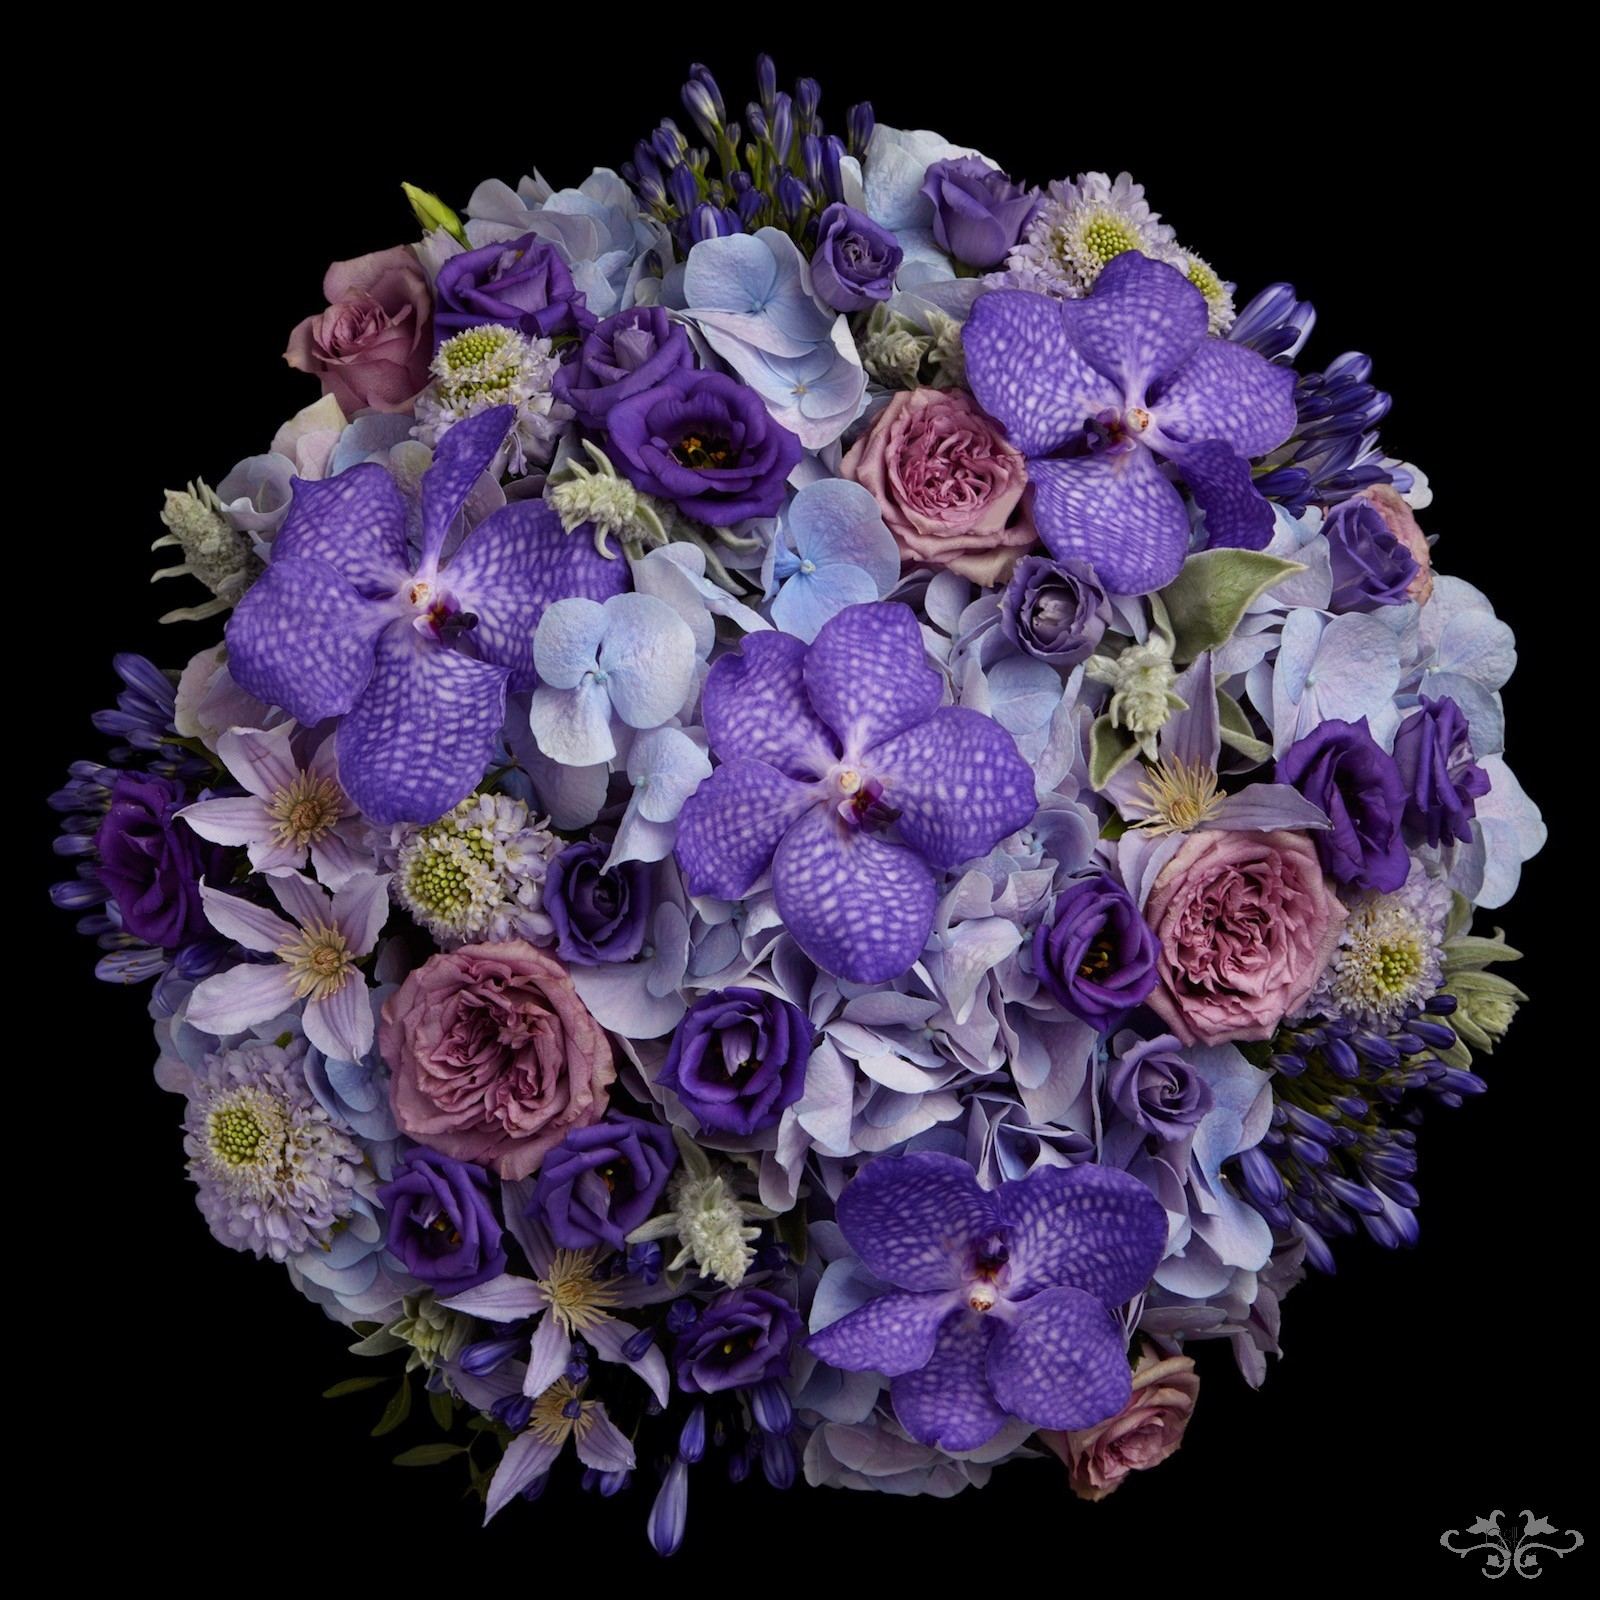 Blue summer flowers Neill Strain Belgravia